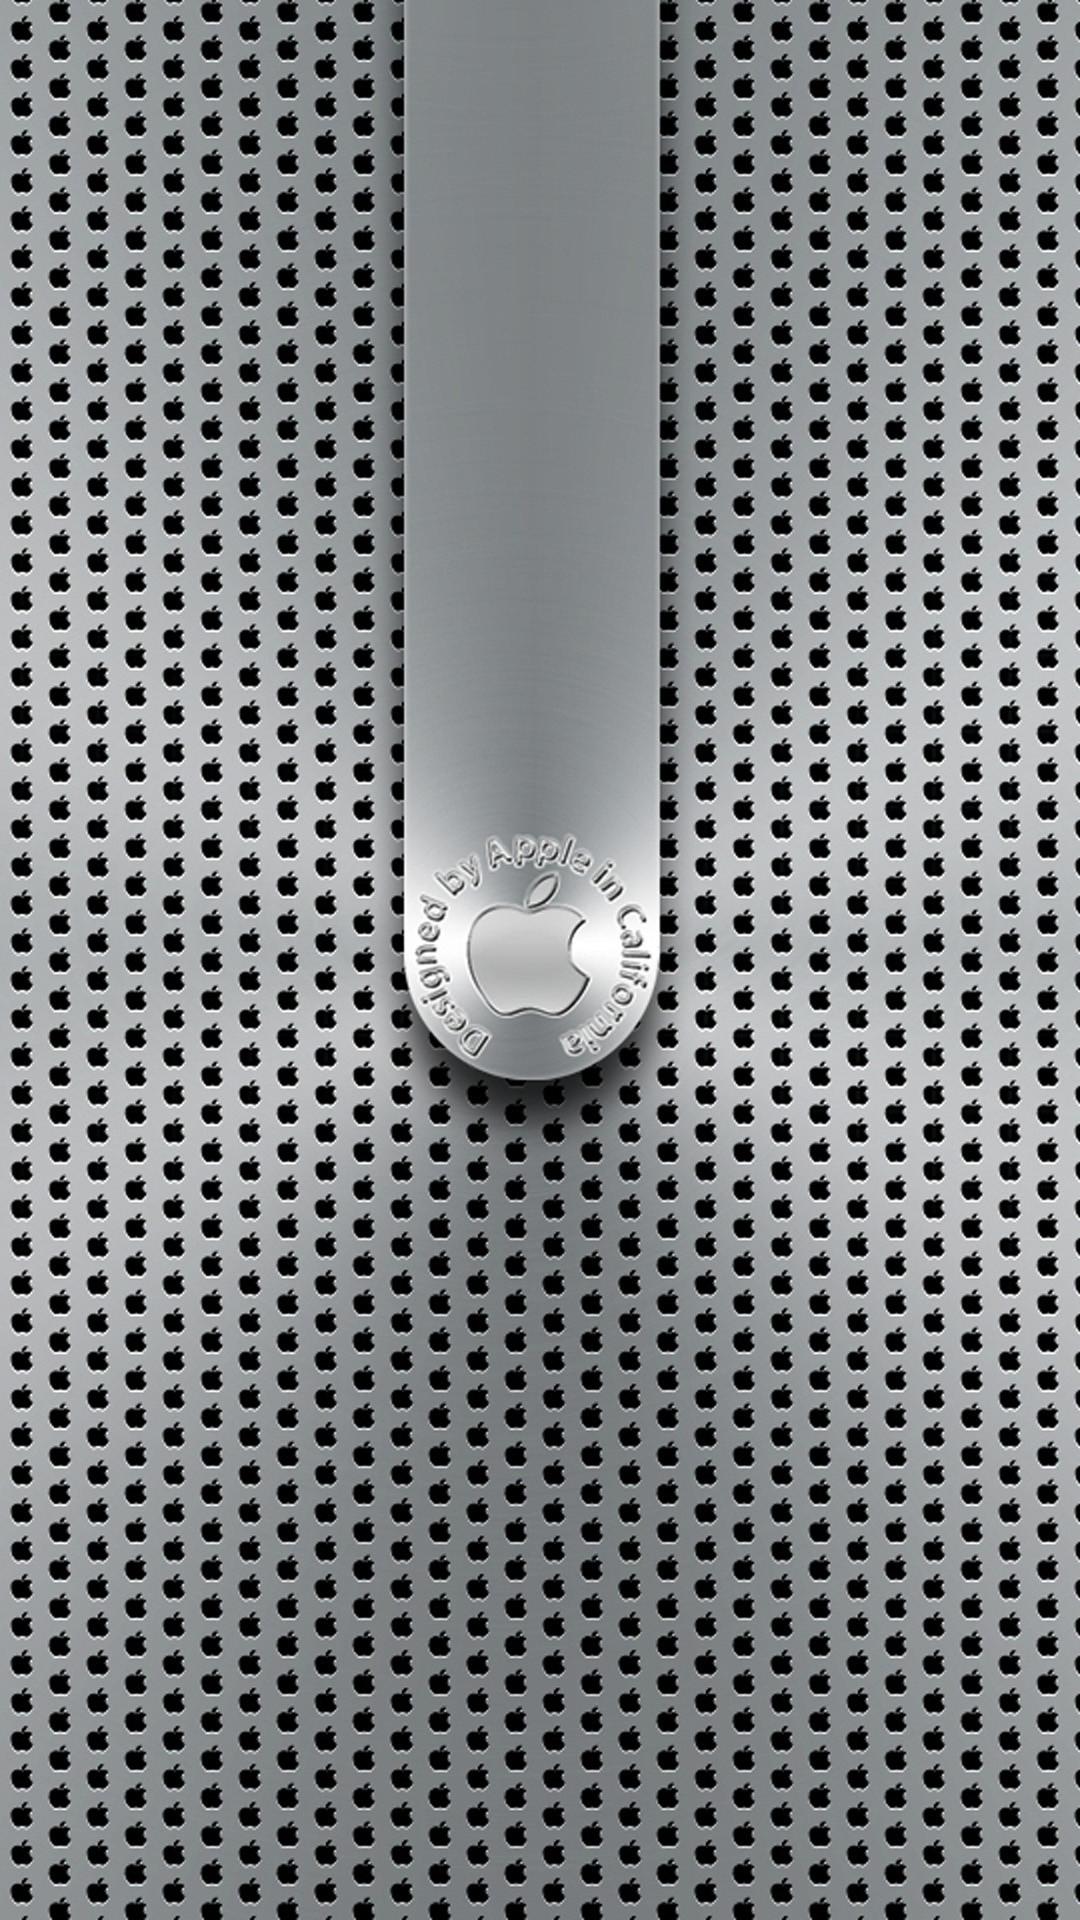 Background Metal apple lockscreen HD Wallpaper iPhone 6 plus